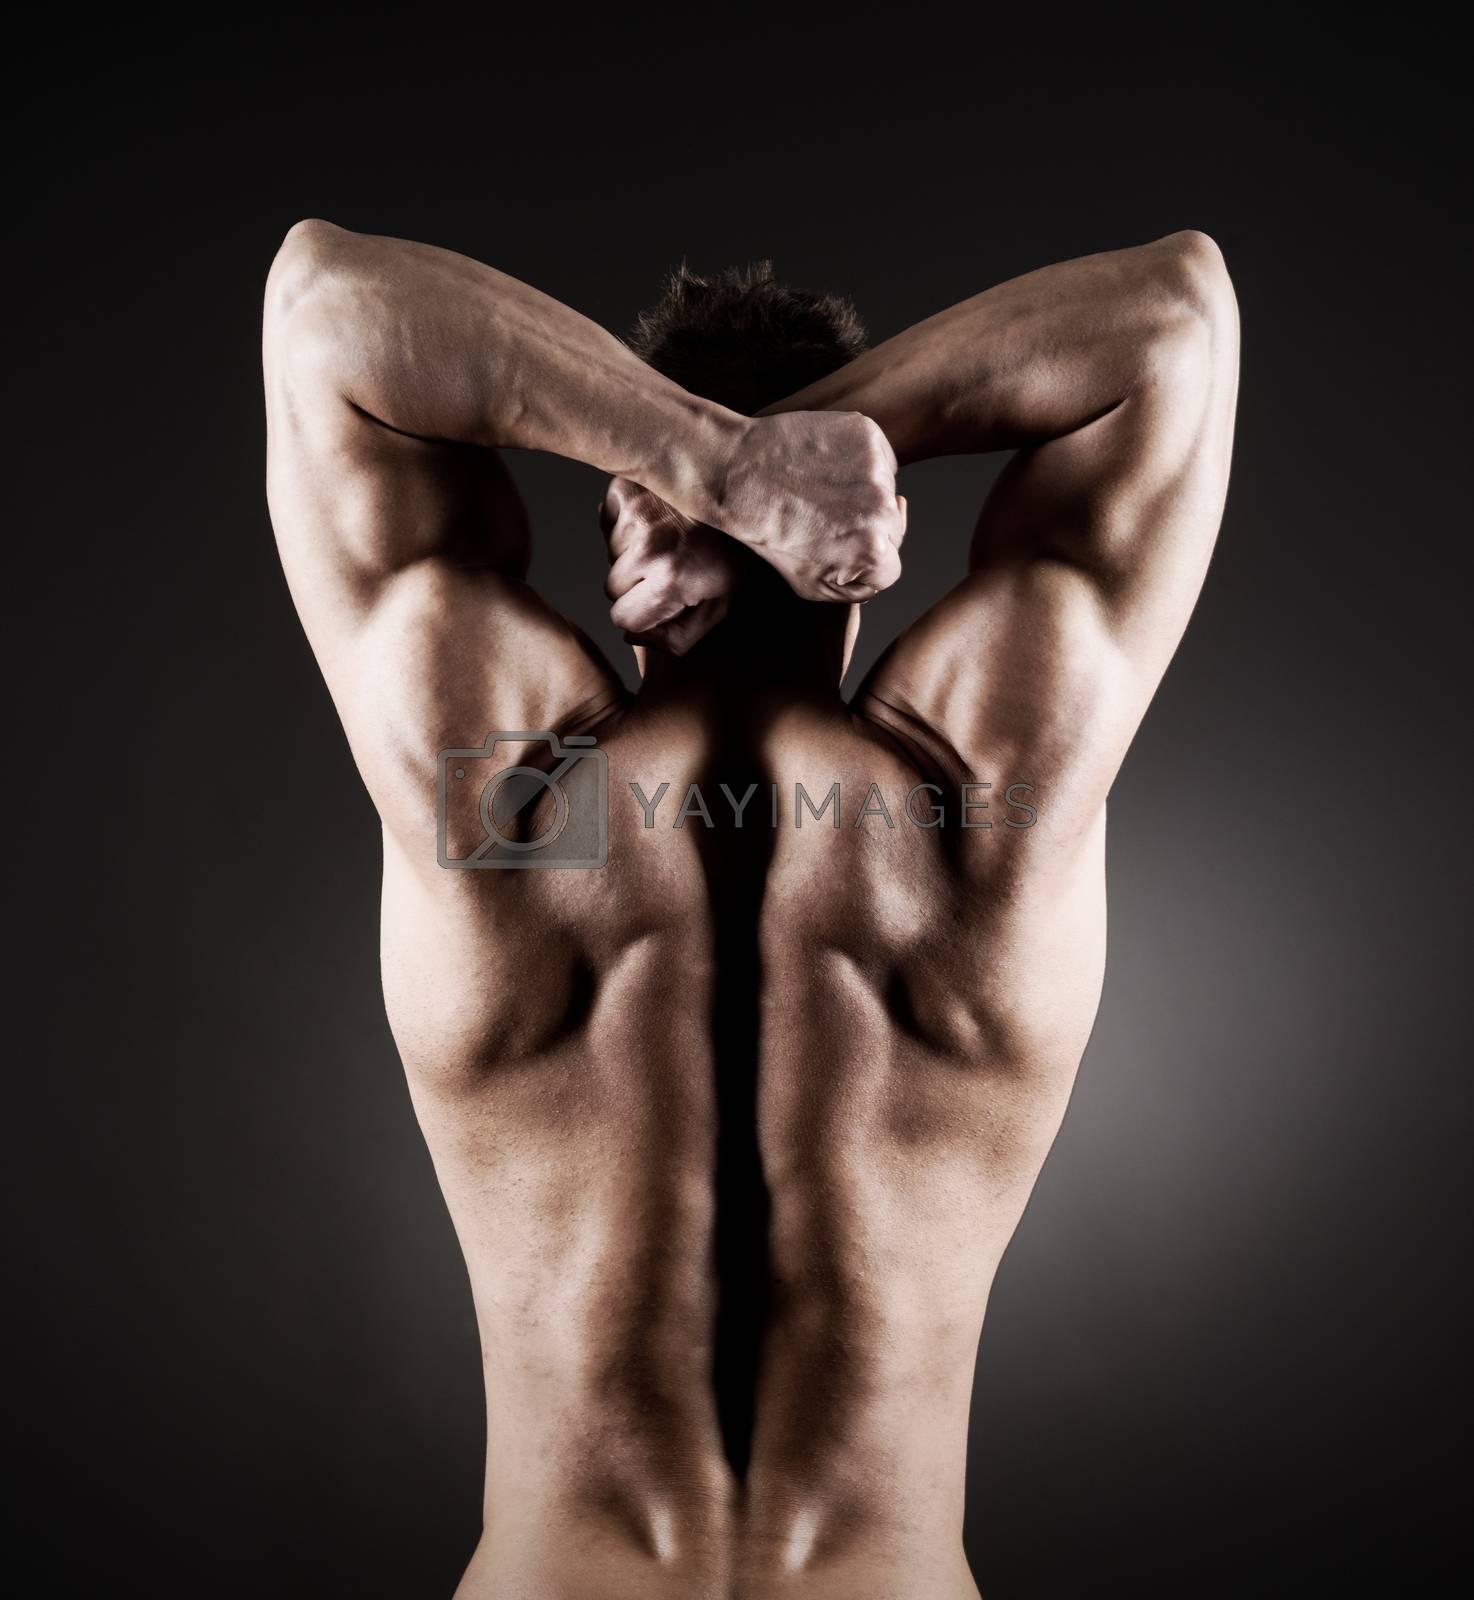 Body builder posing on dark background, rear view.